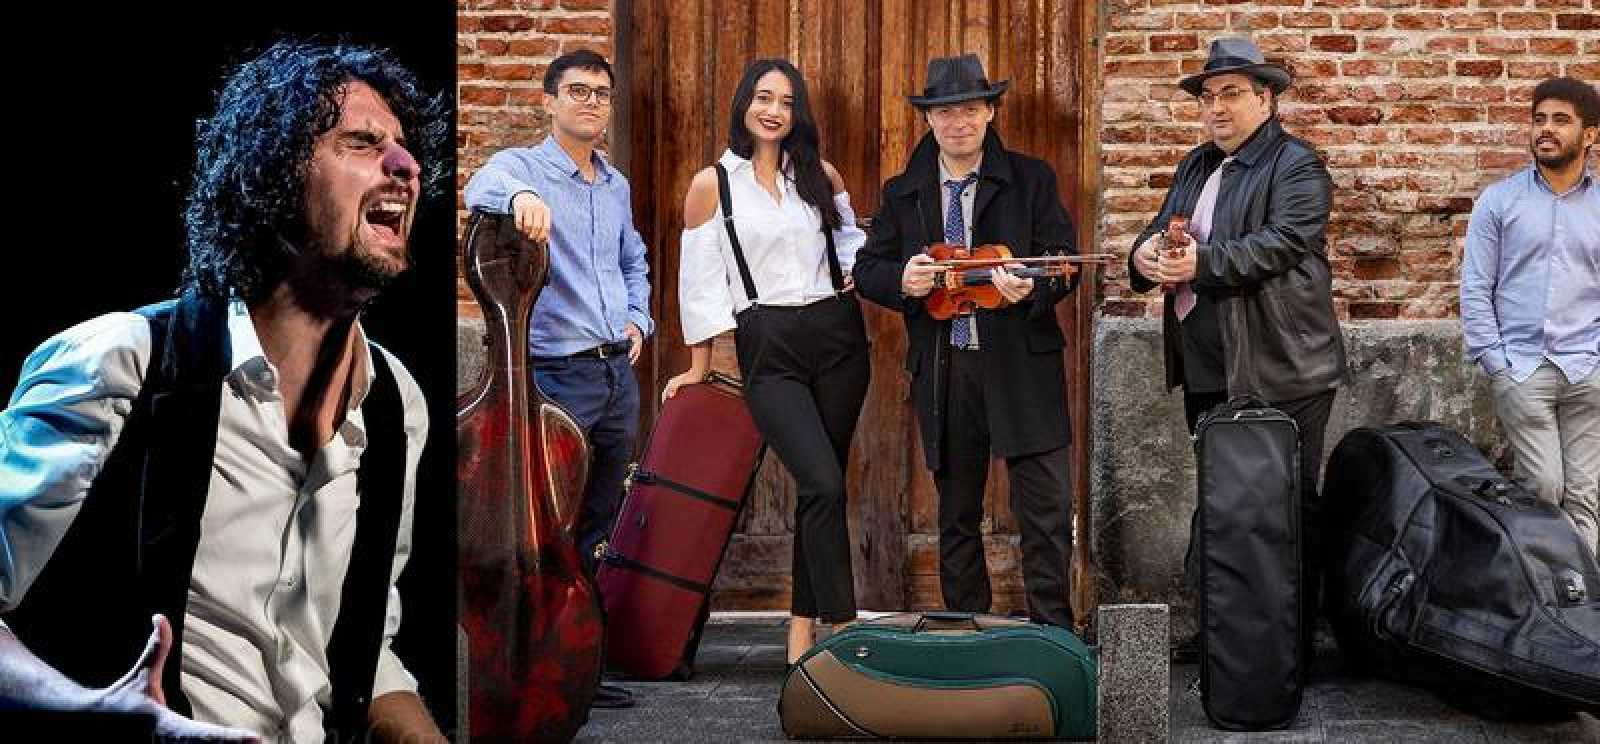 Muzzic Ensemble y El Mati